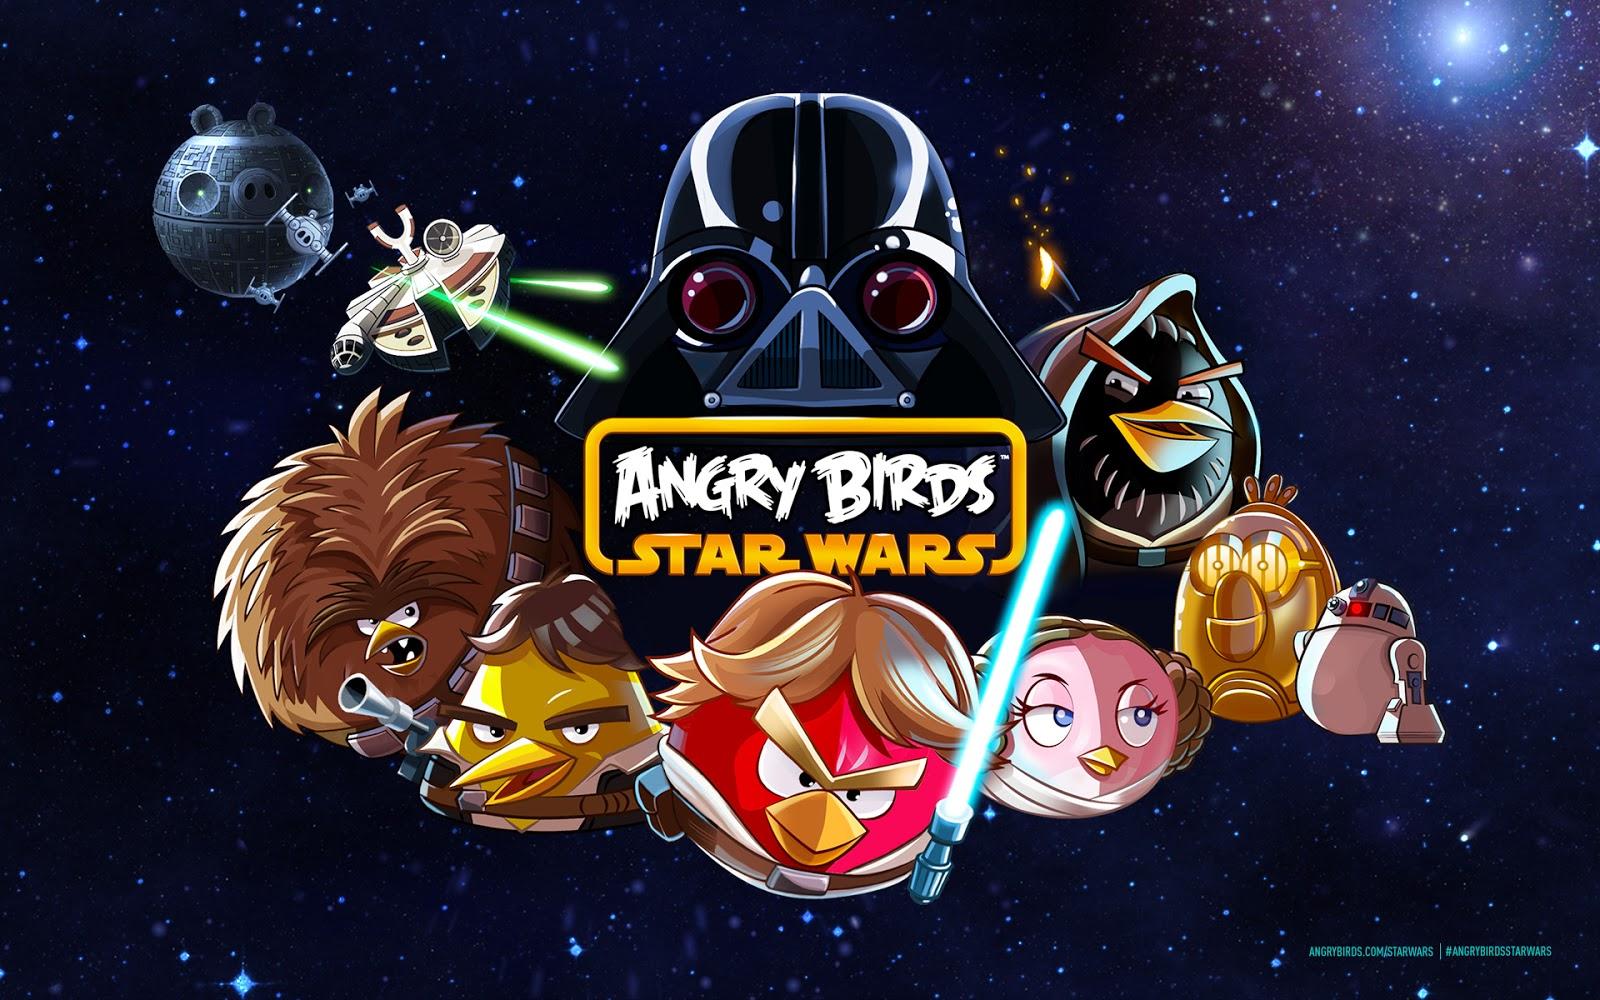 http://2.bp.blogspot.com/-r7rNPVp5U24/UPqIMTV6-FI/AAAAAAAAANU/OVupQSed5NE/s1600/Angry-Birds-Star-Wars-Wallpaper-angry-birds-32422194-1920-1200.jpg